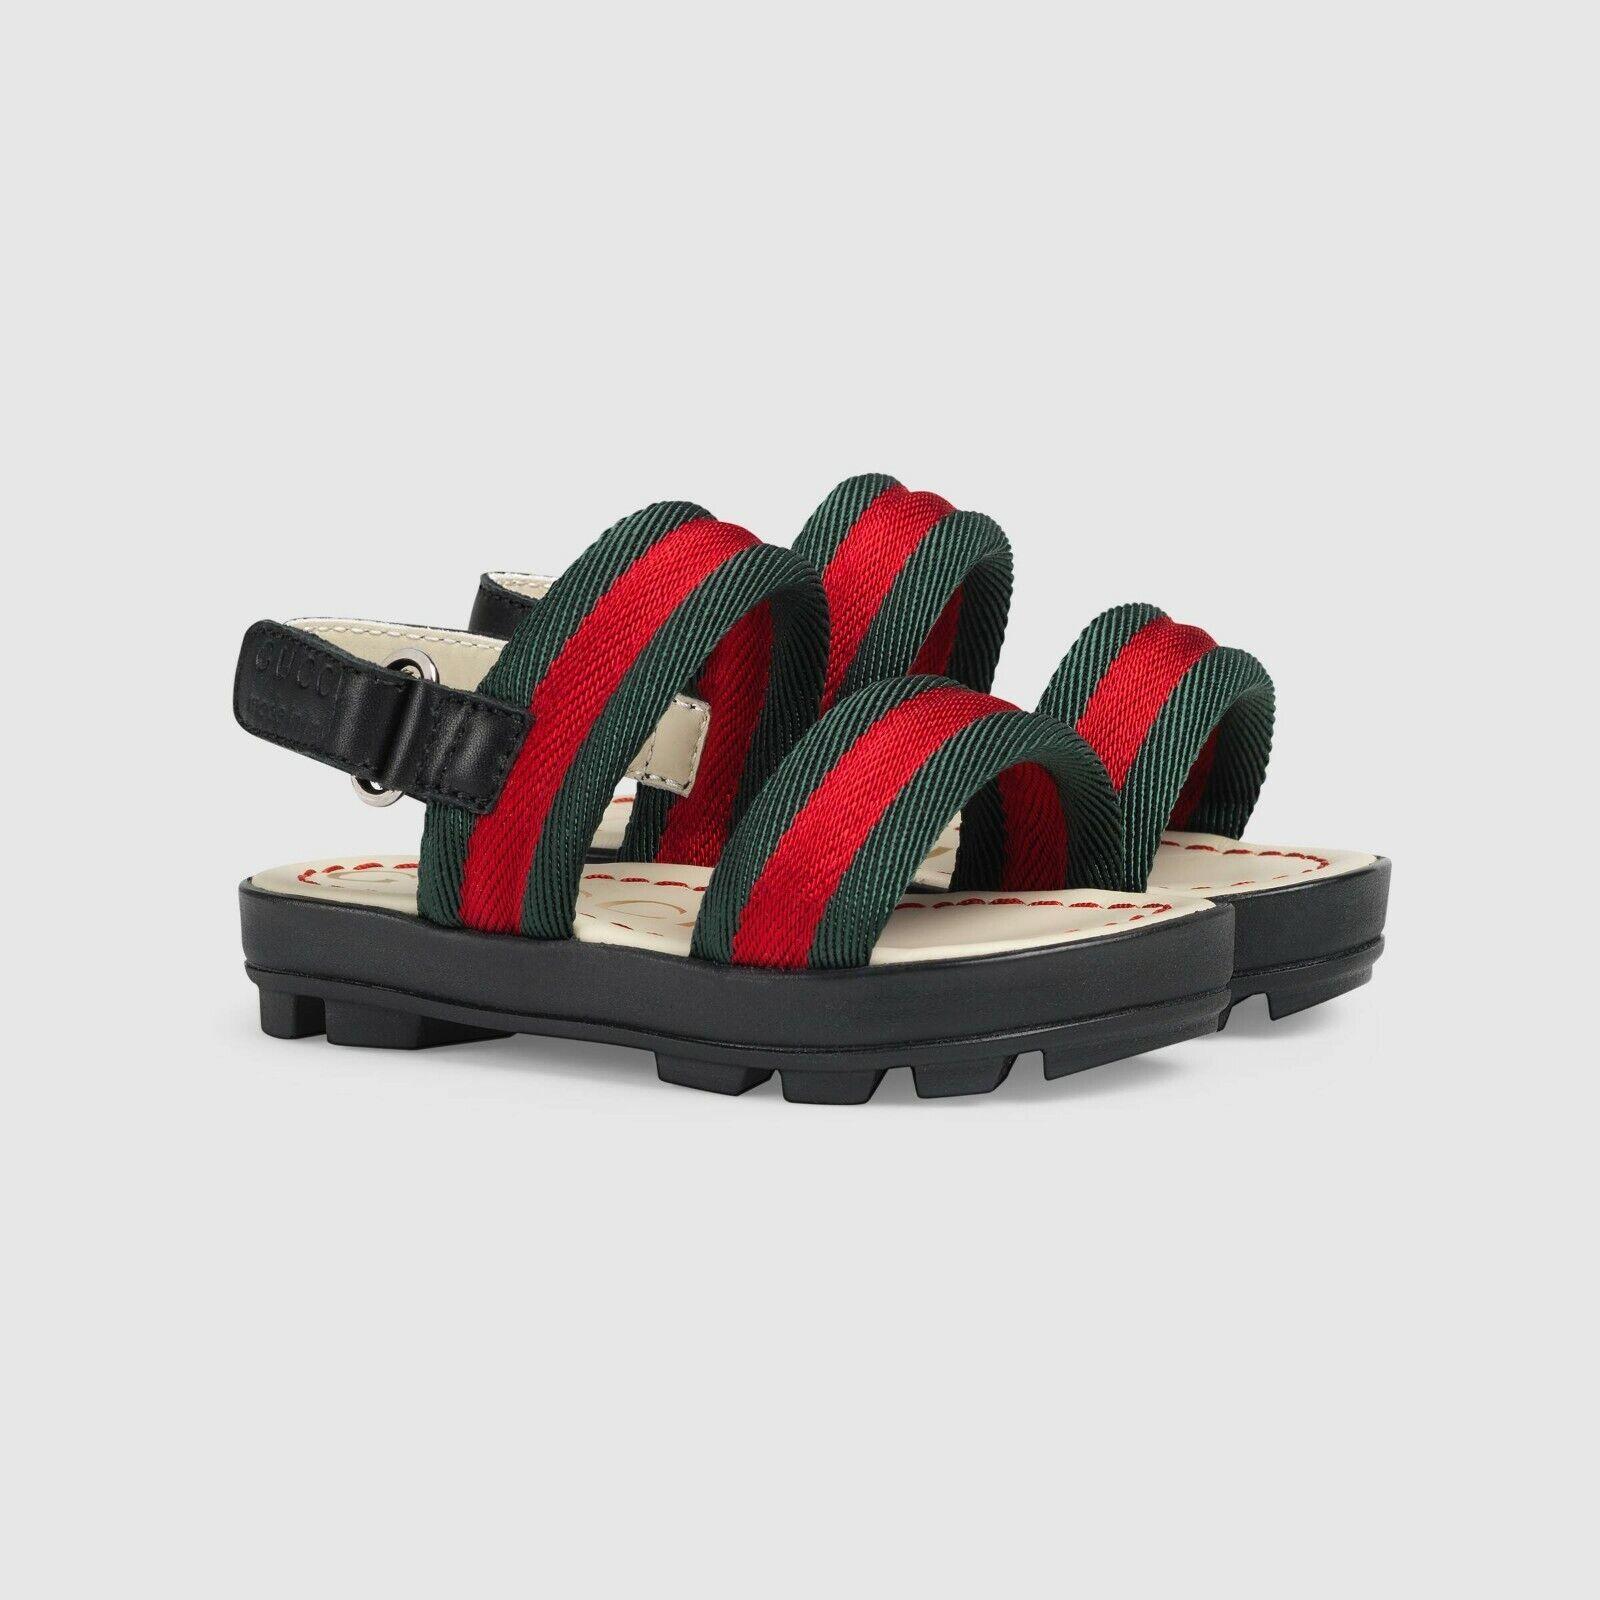 NIB NEW Gucci boys girls black green red web sandals 20 23 24 501058